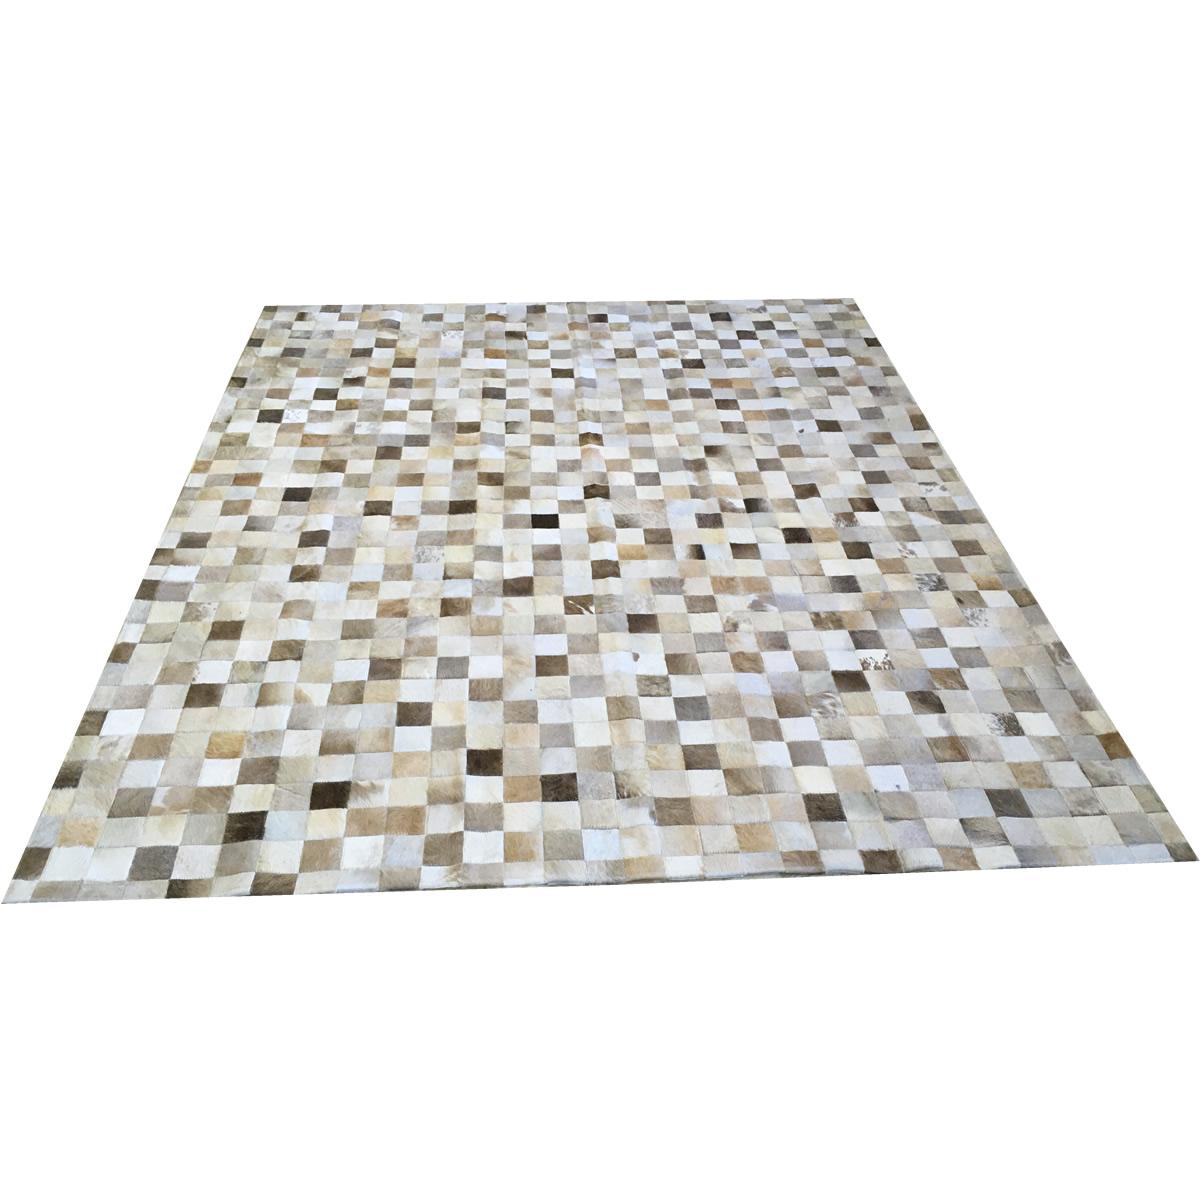 Tapete de couro cinza natural 2,00x2,50 sem bordas